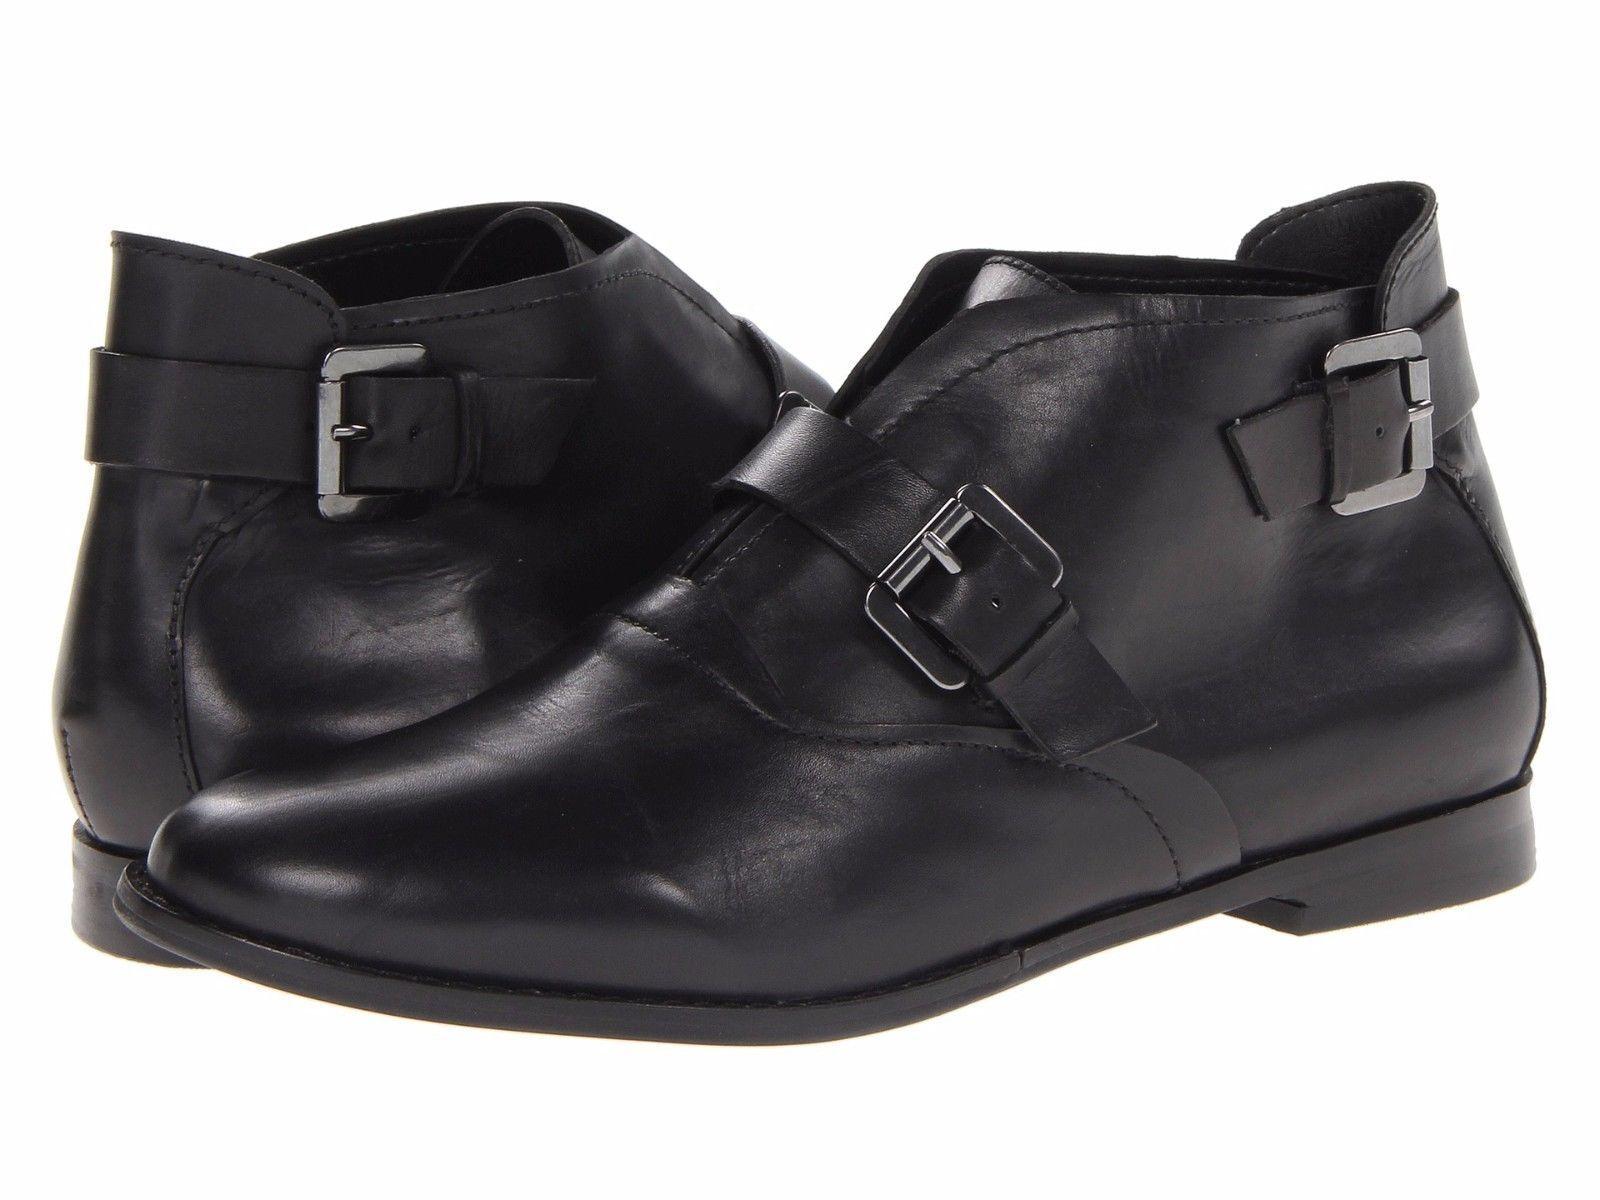 Size 8.5 Shoe! KENNETH COLE (Leather) Womens Boot Shoe! 8.5 Reg$188 Sale$64.99 LastPair! 042b43